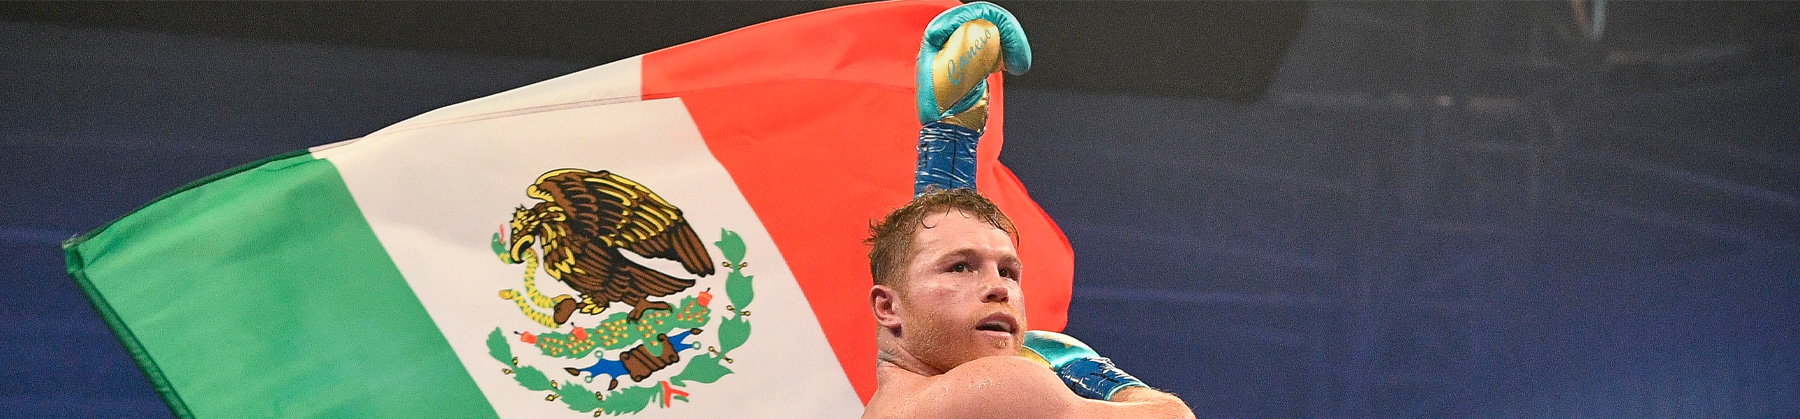 Canelo Álvarez ondea la bandera mexicana